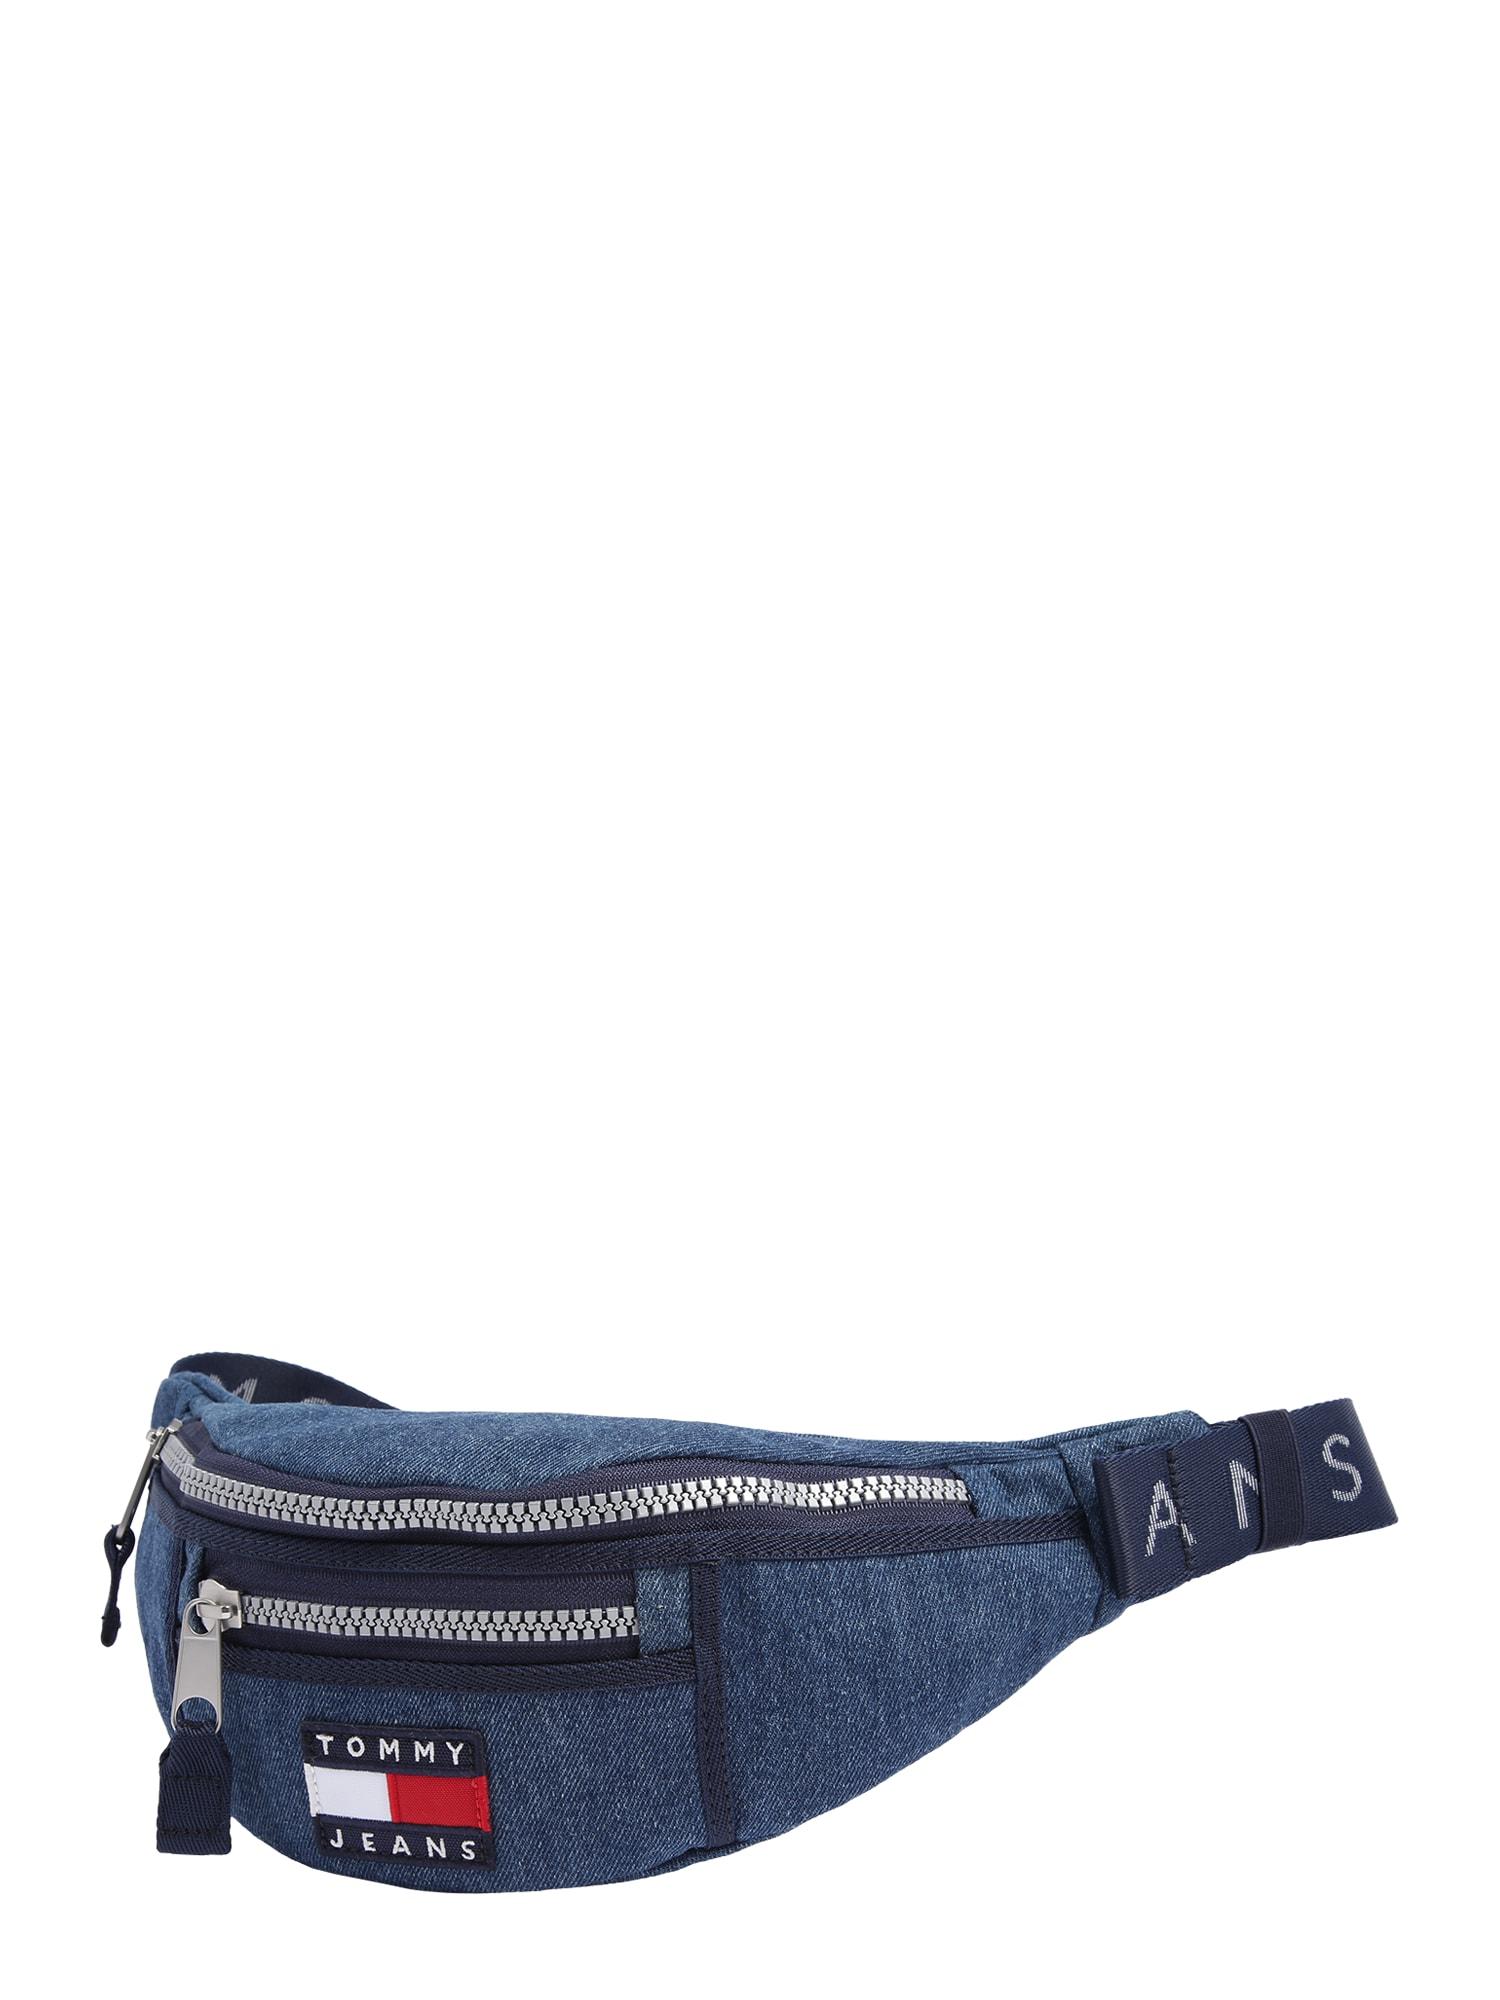 Tommy Jeans Rankinė ant juosmens 'TJW HERITAGE BUMBAG DENIM' tamsiai (džinso) mėlyna